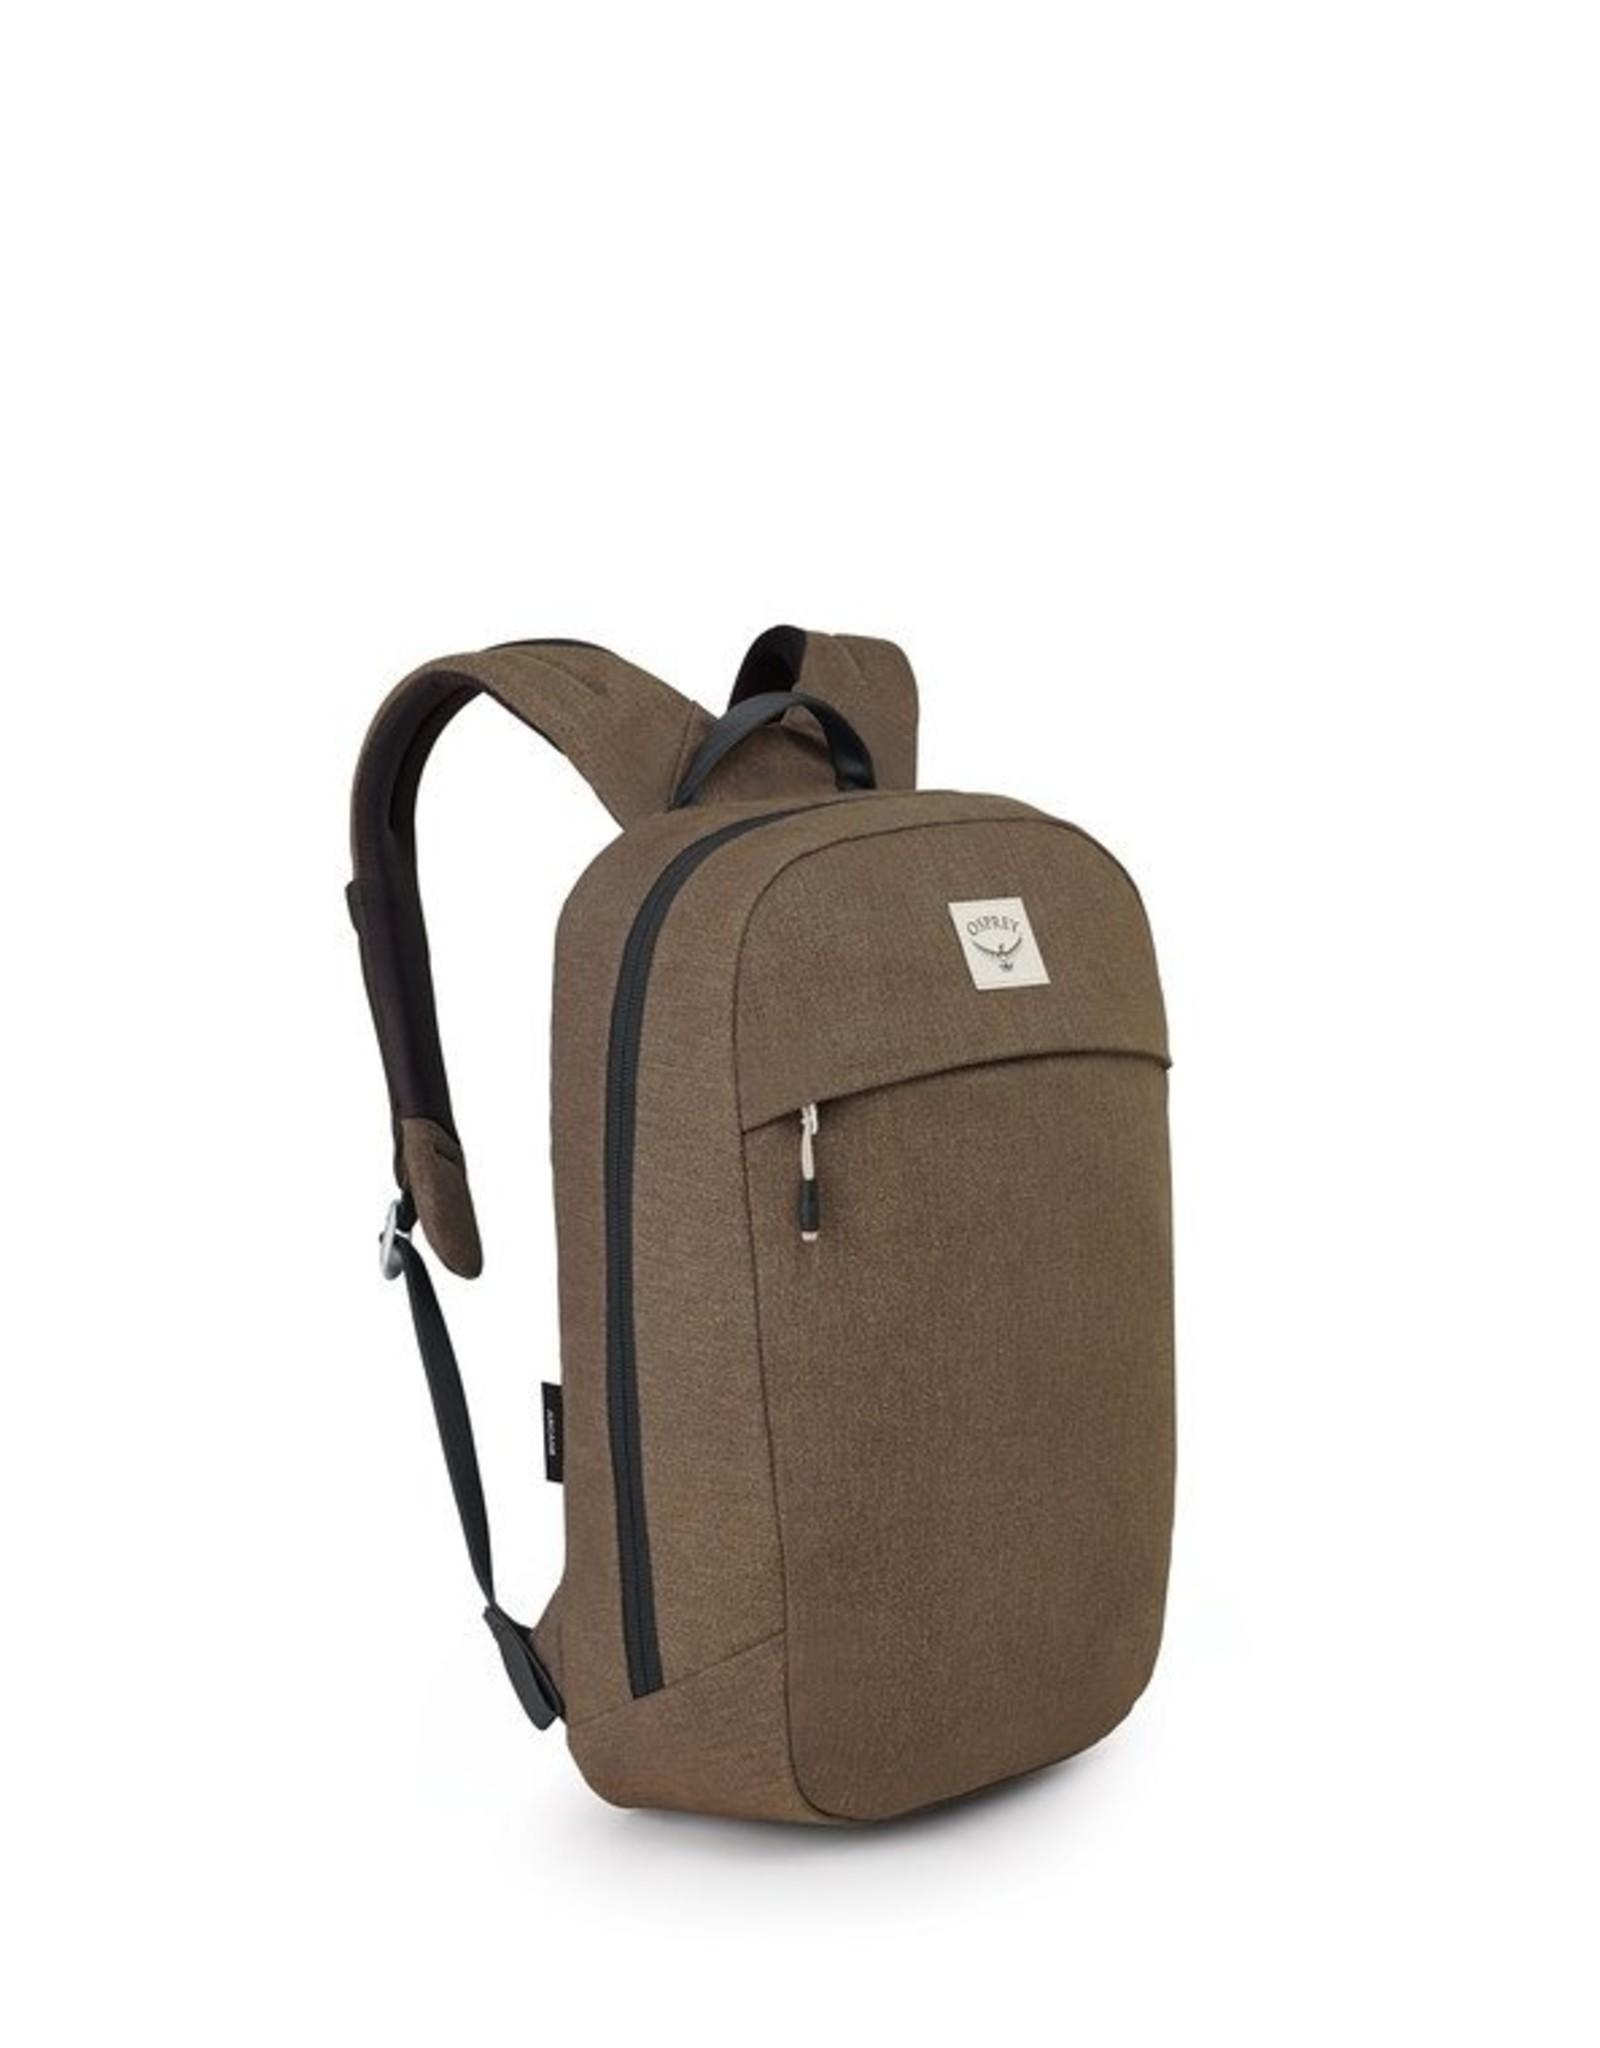 Osprey Osprey Arcane Large Day Pack Limited Hemp Roast Bean Brown